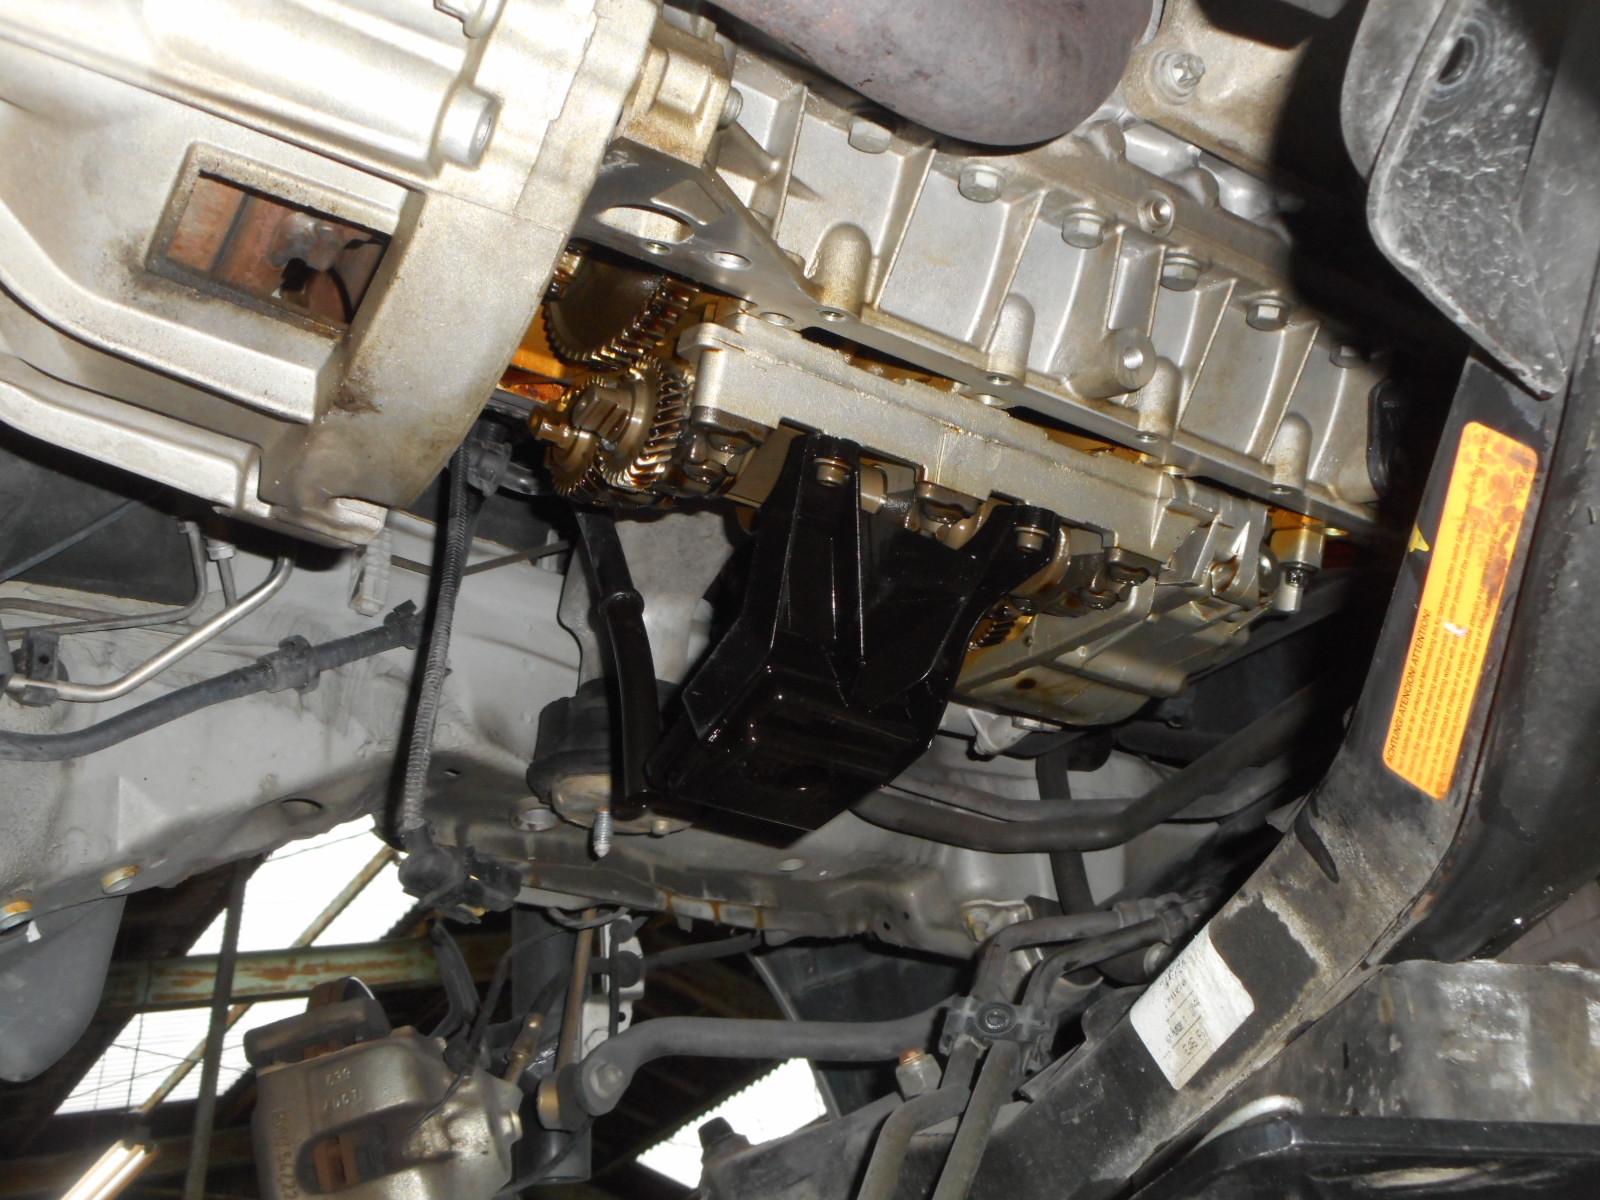 BMW 318i (E46) エンジンオイル漏れ 修理(オイルパンガスケット交換)_c0267693_15395314.jpg